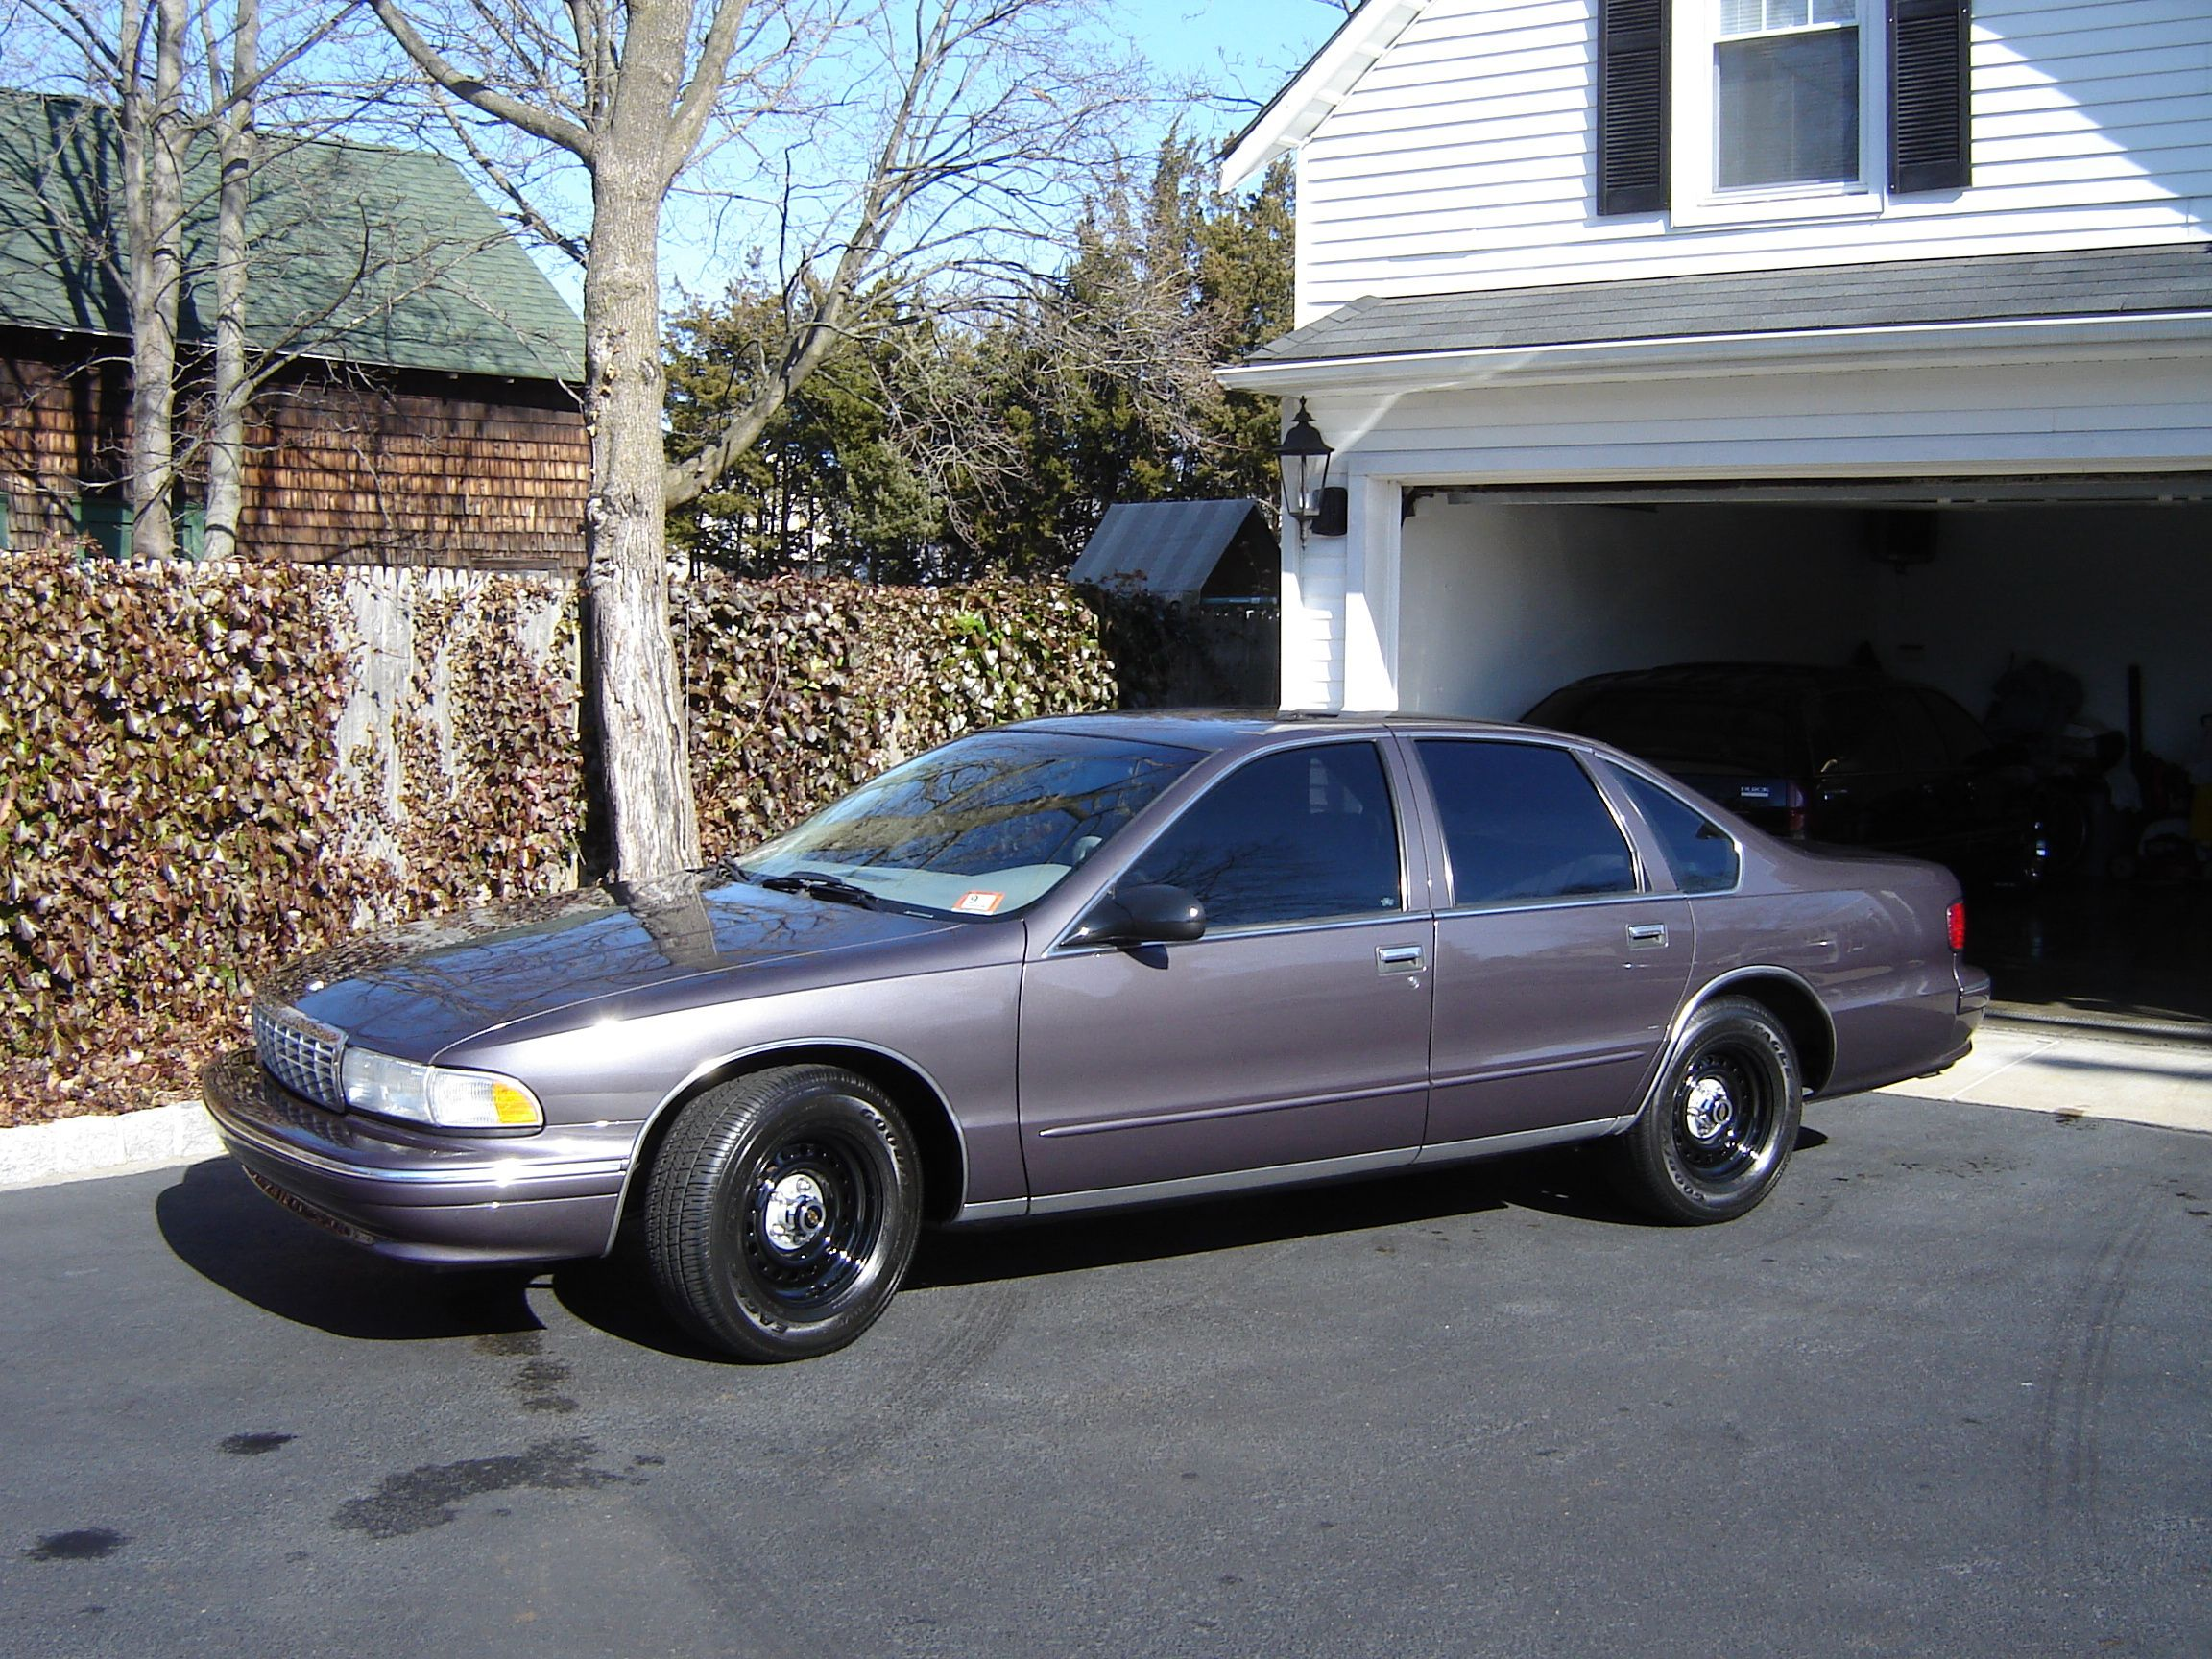 1995 chevrolet caprice cop car  [ 2304 x 1728 Pixel ]